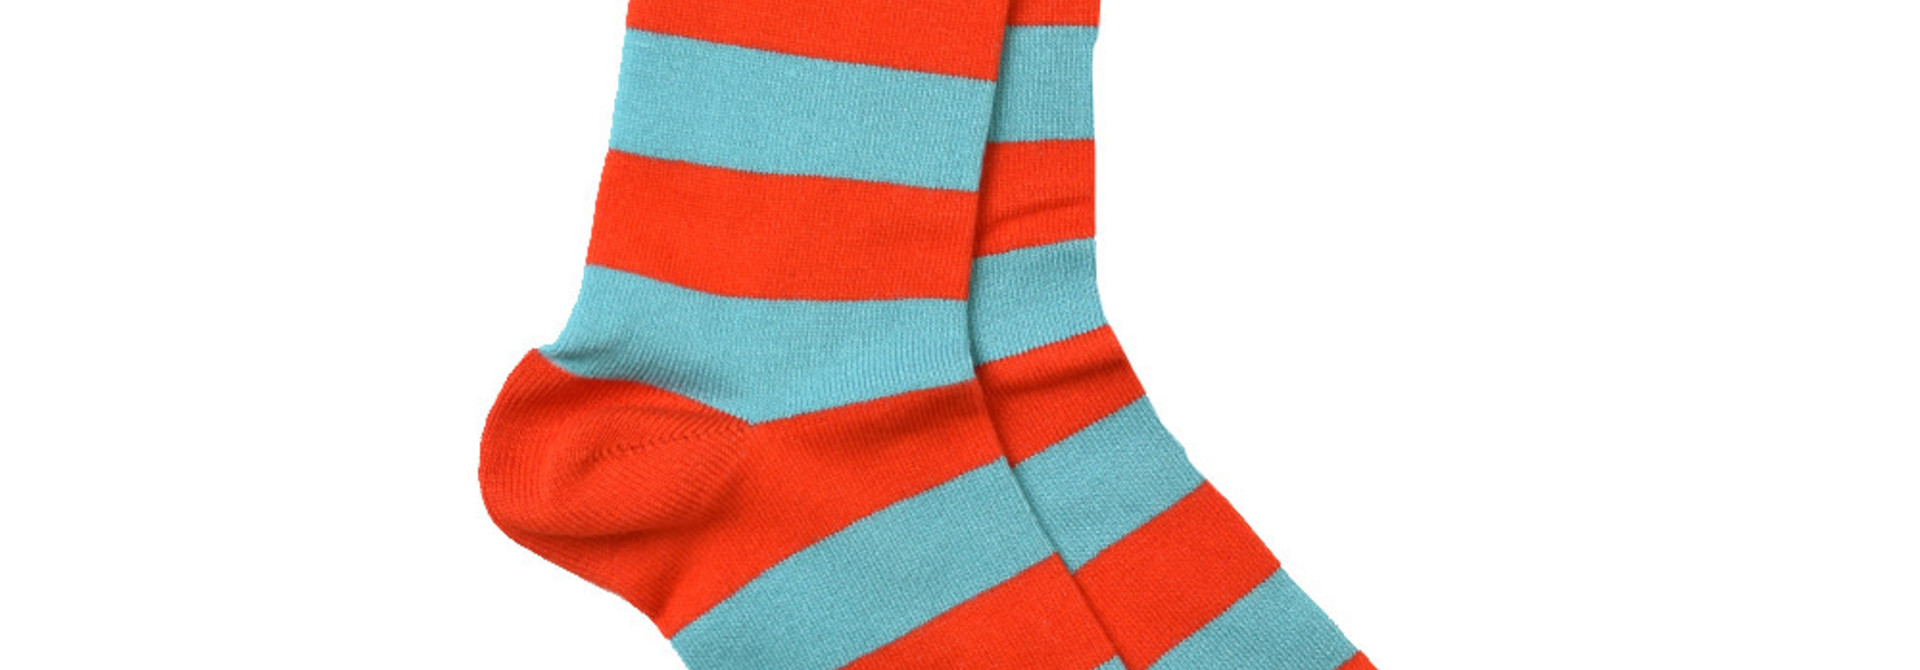 Red/Cornflower Socks